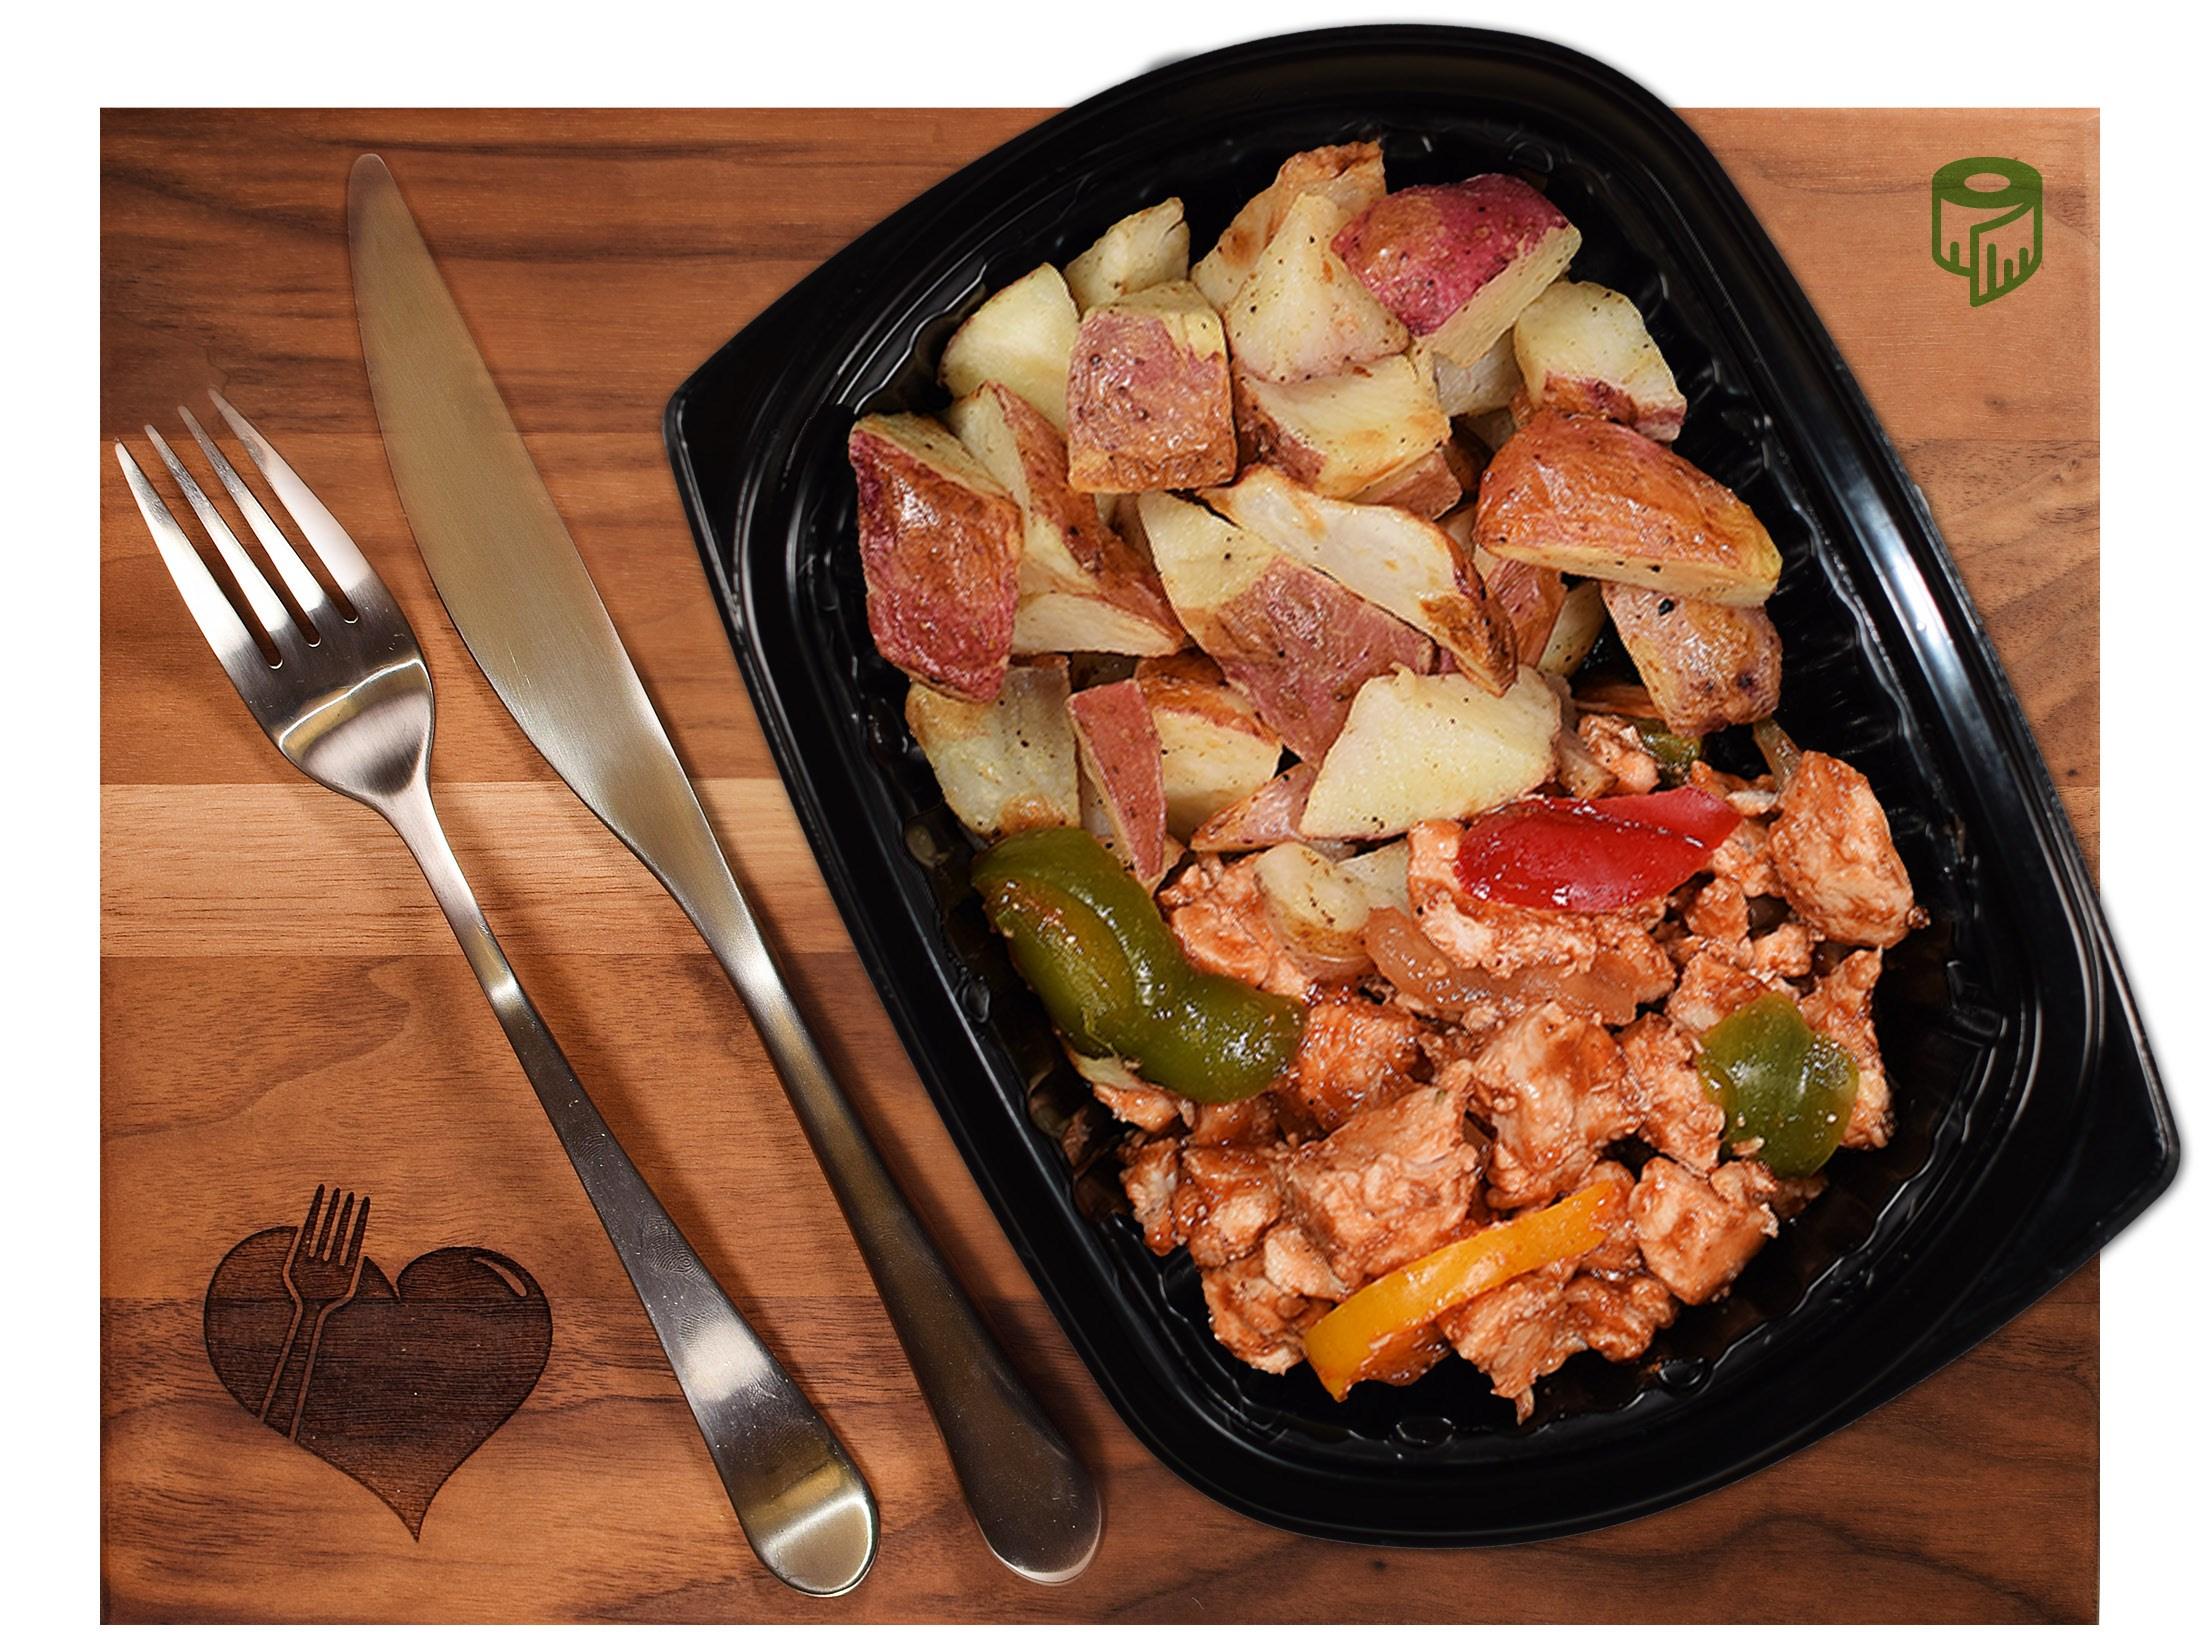 BBQ Chicken w/ Red Potatoes